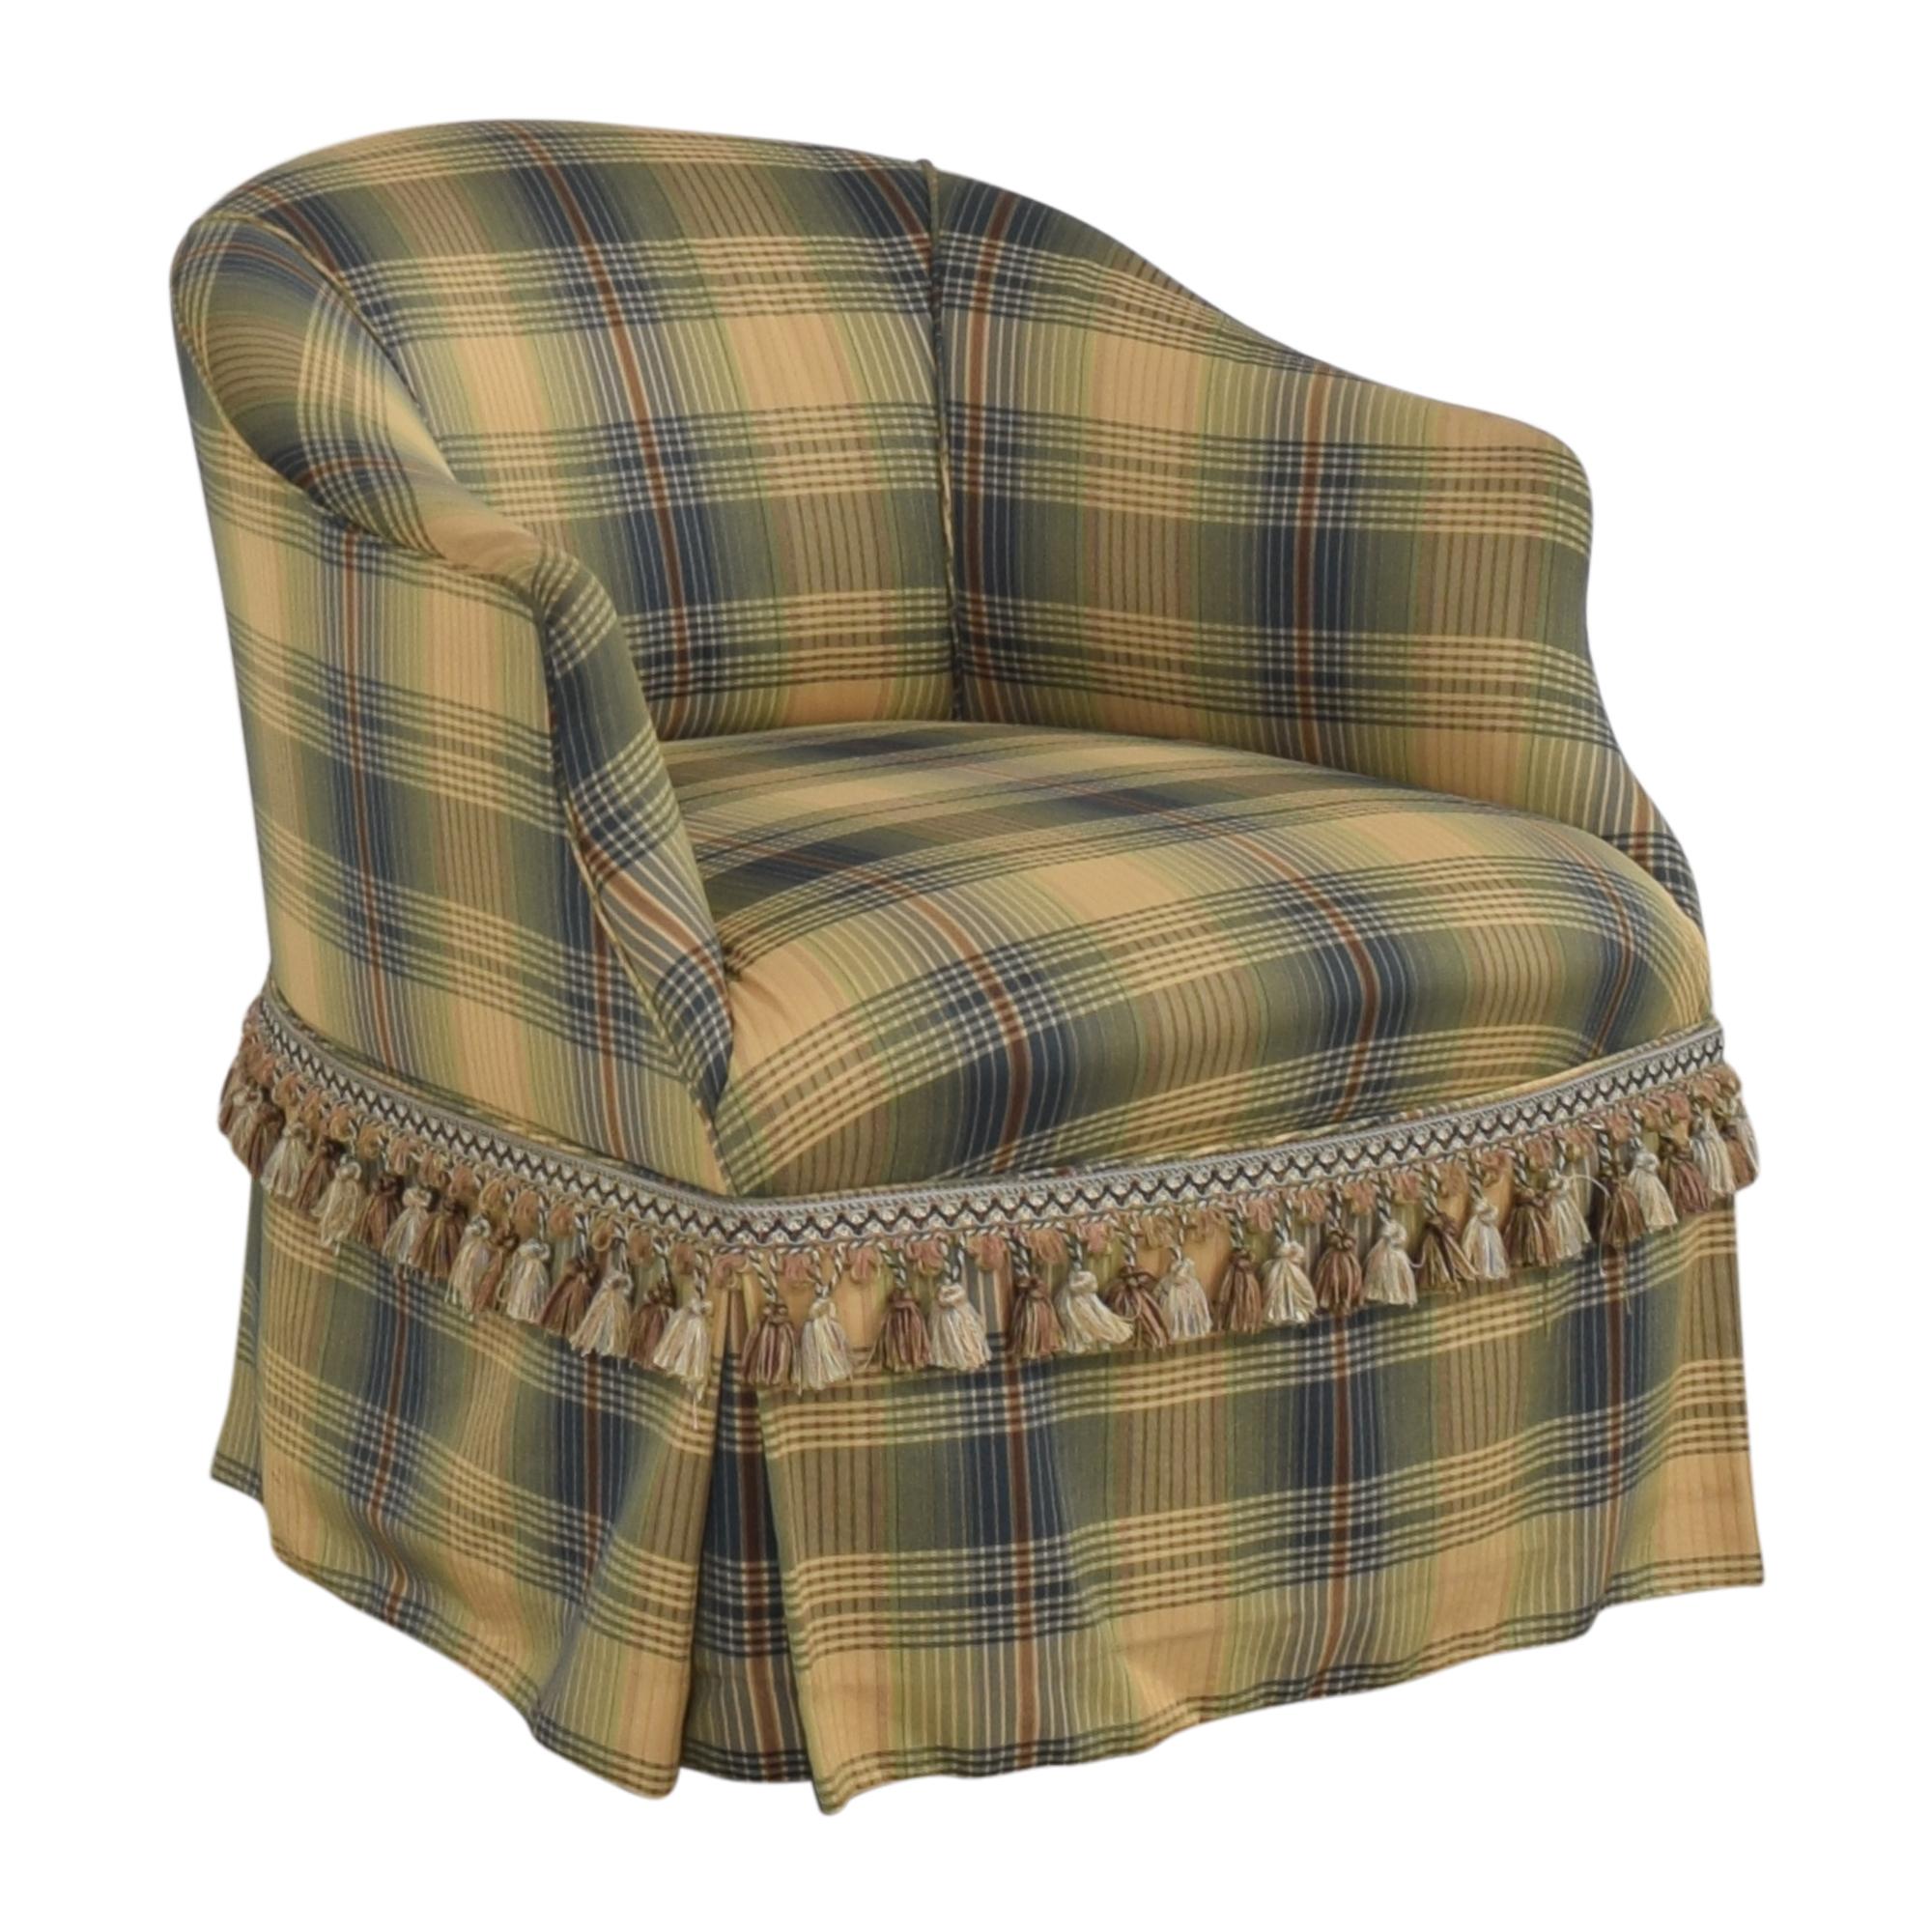 Custom Swivel Chair with Fringe sale